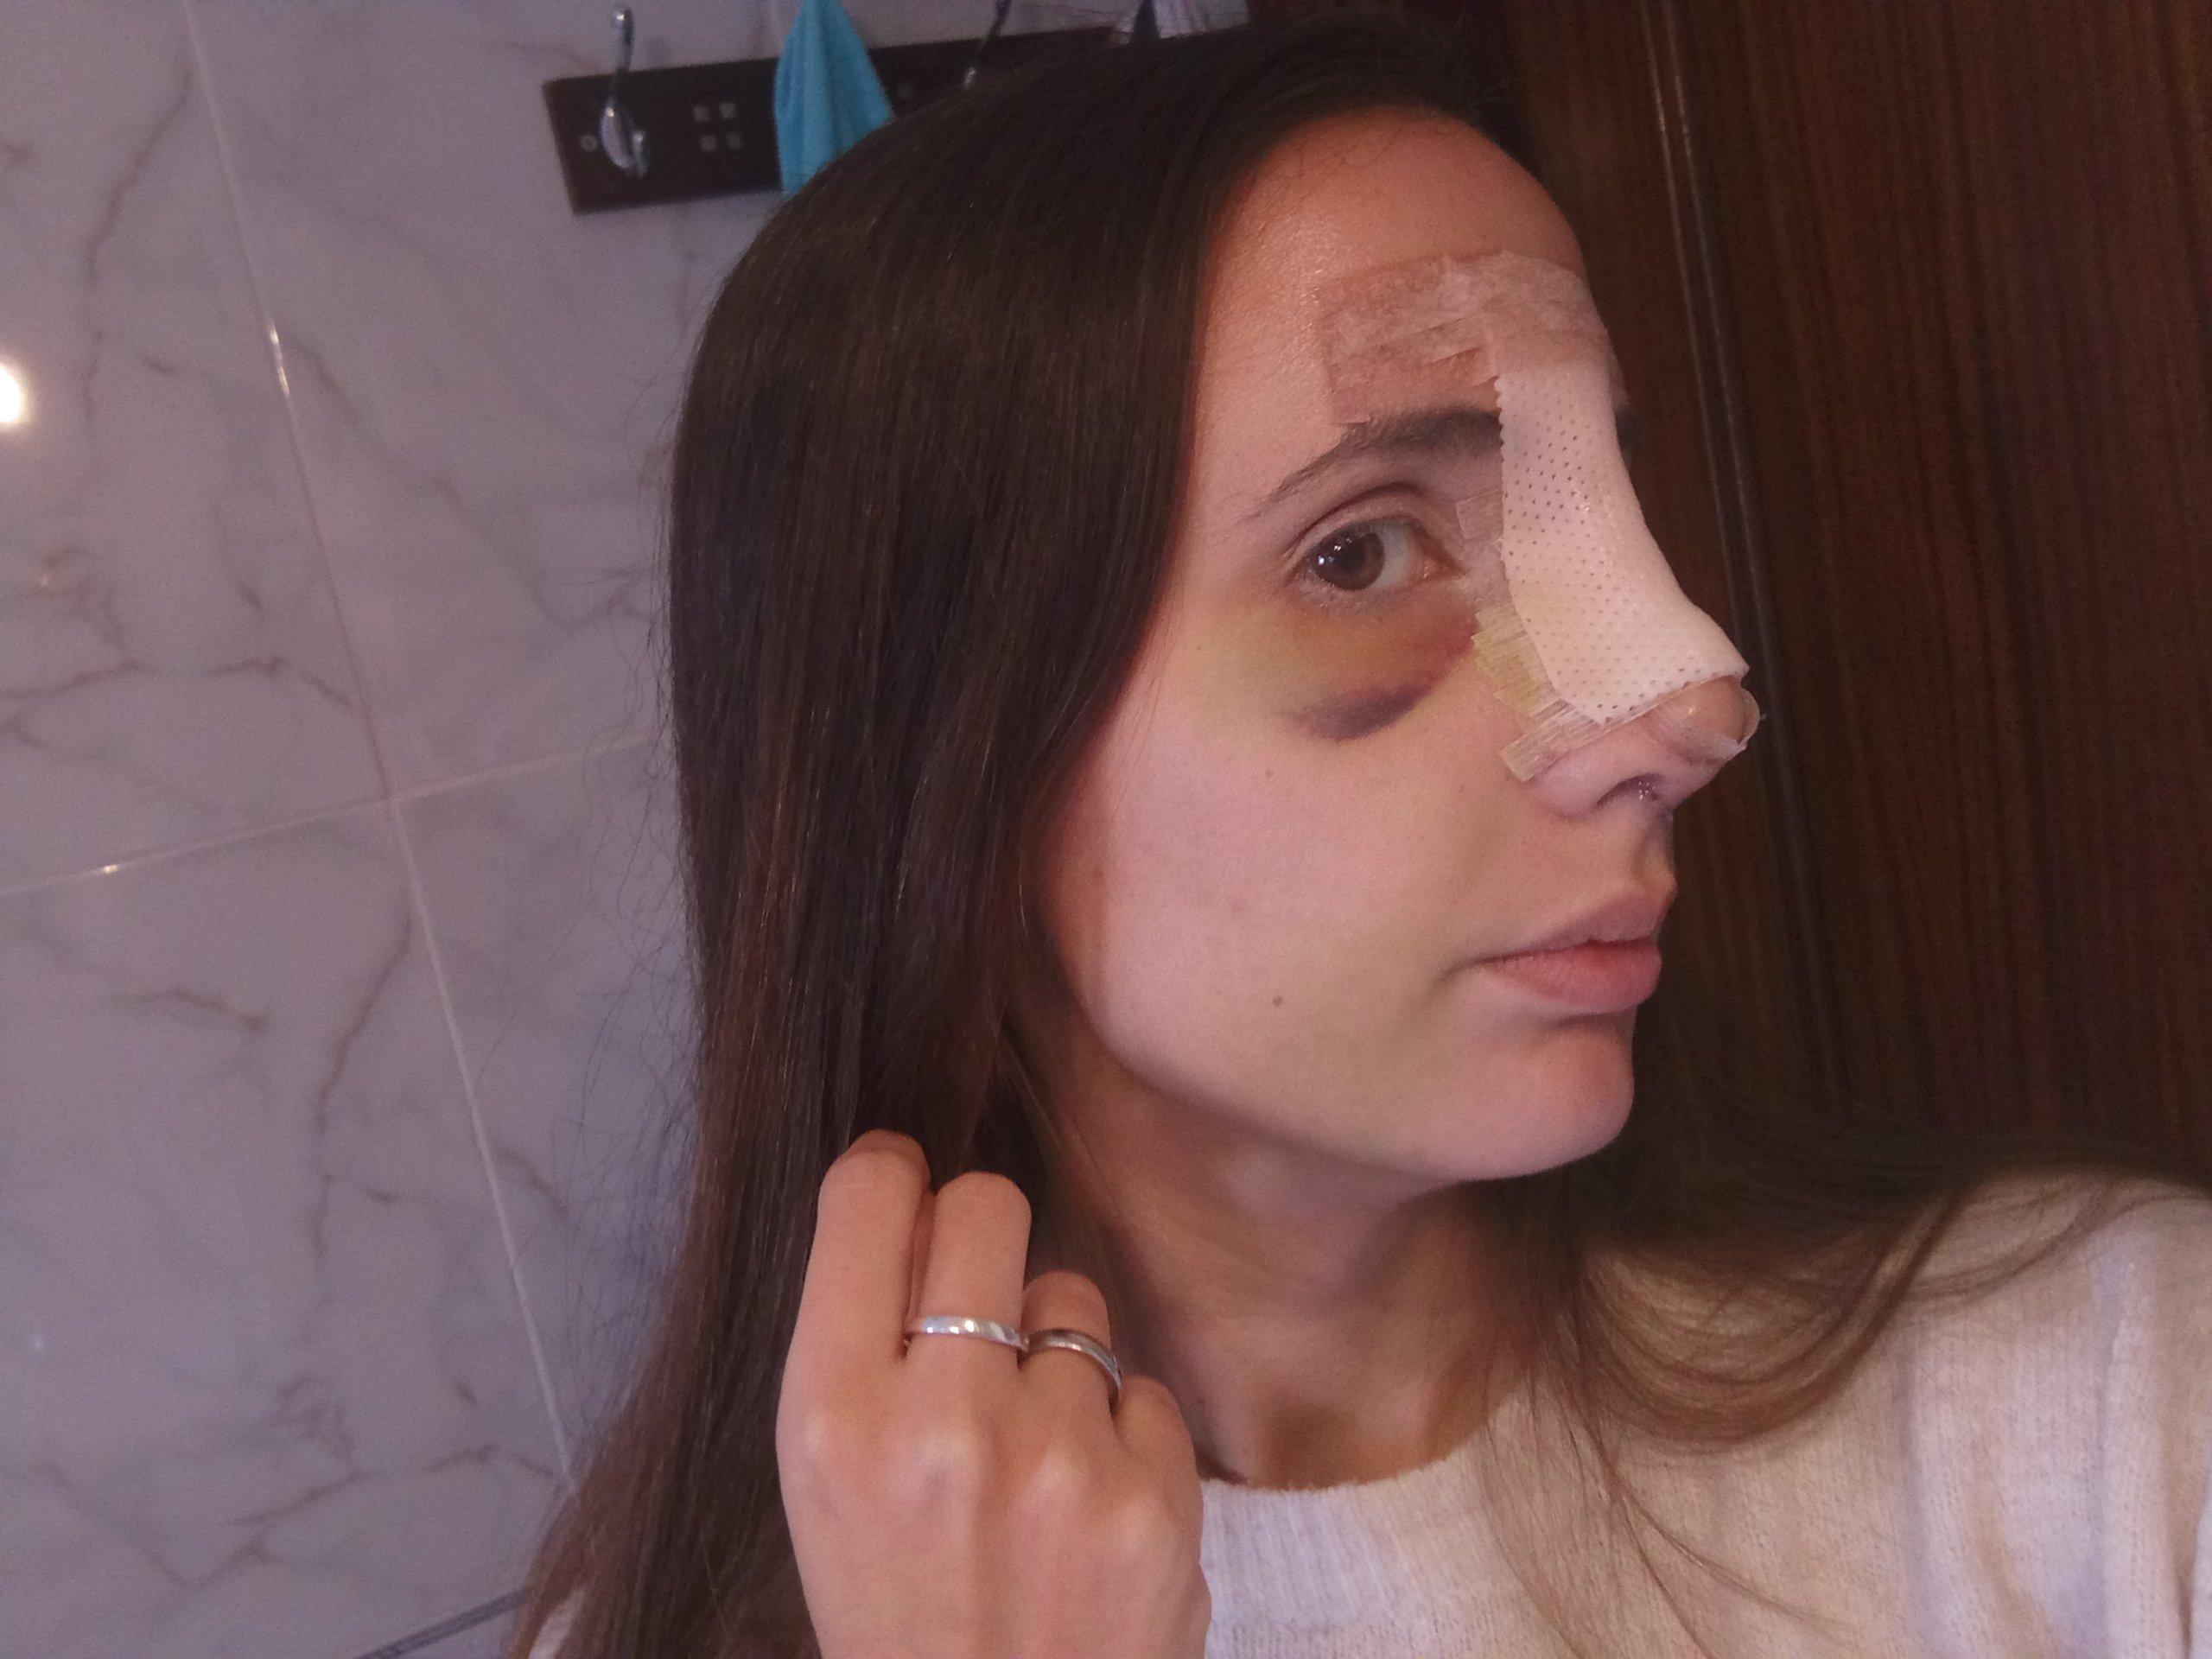 La nariz se siente obstruida después de la rinoplastia